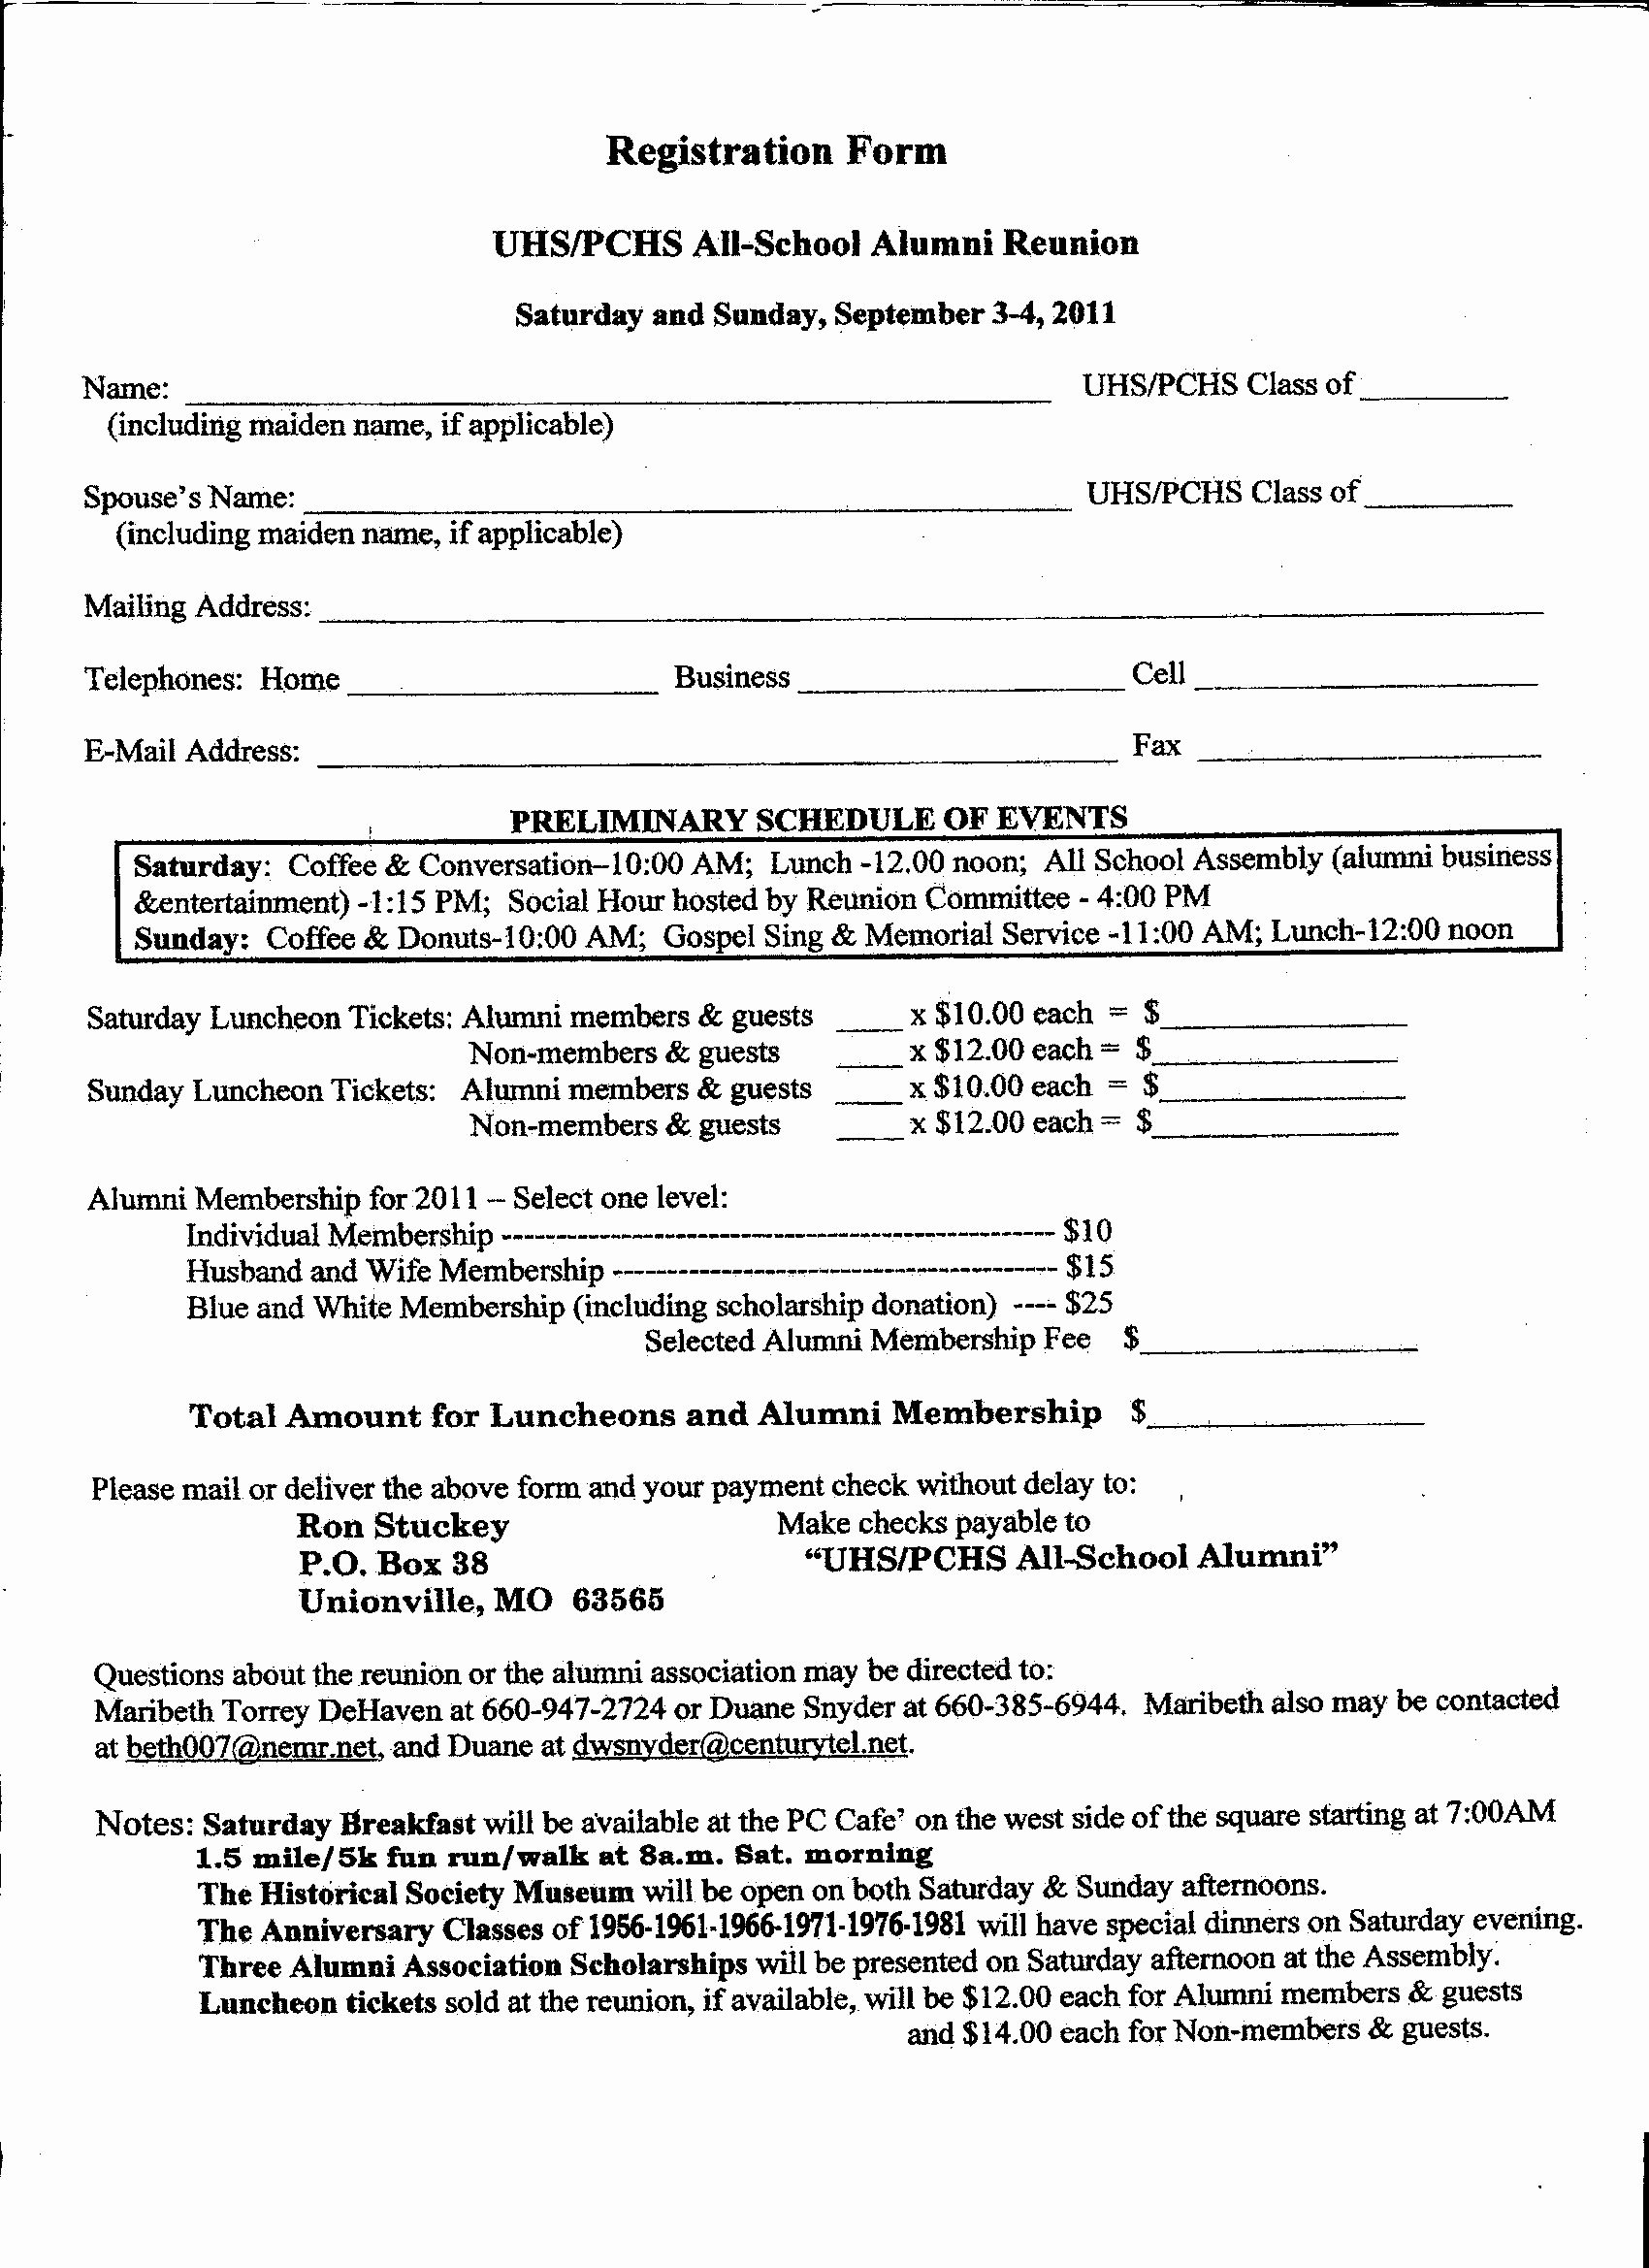 School Registration form Template Beautiful School Registration form Template Portablegasgrillweber